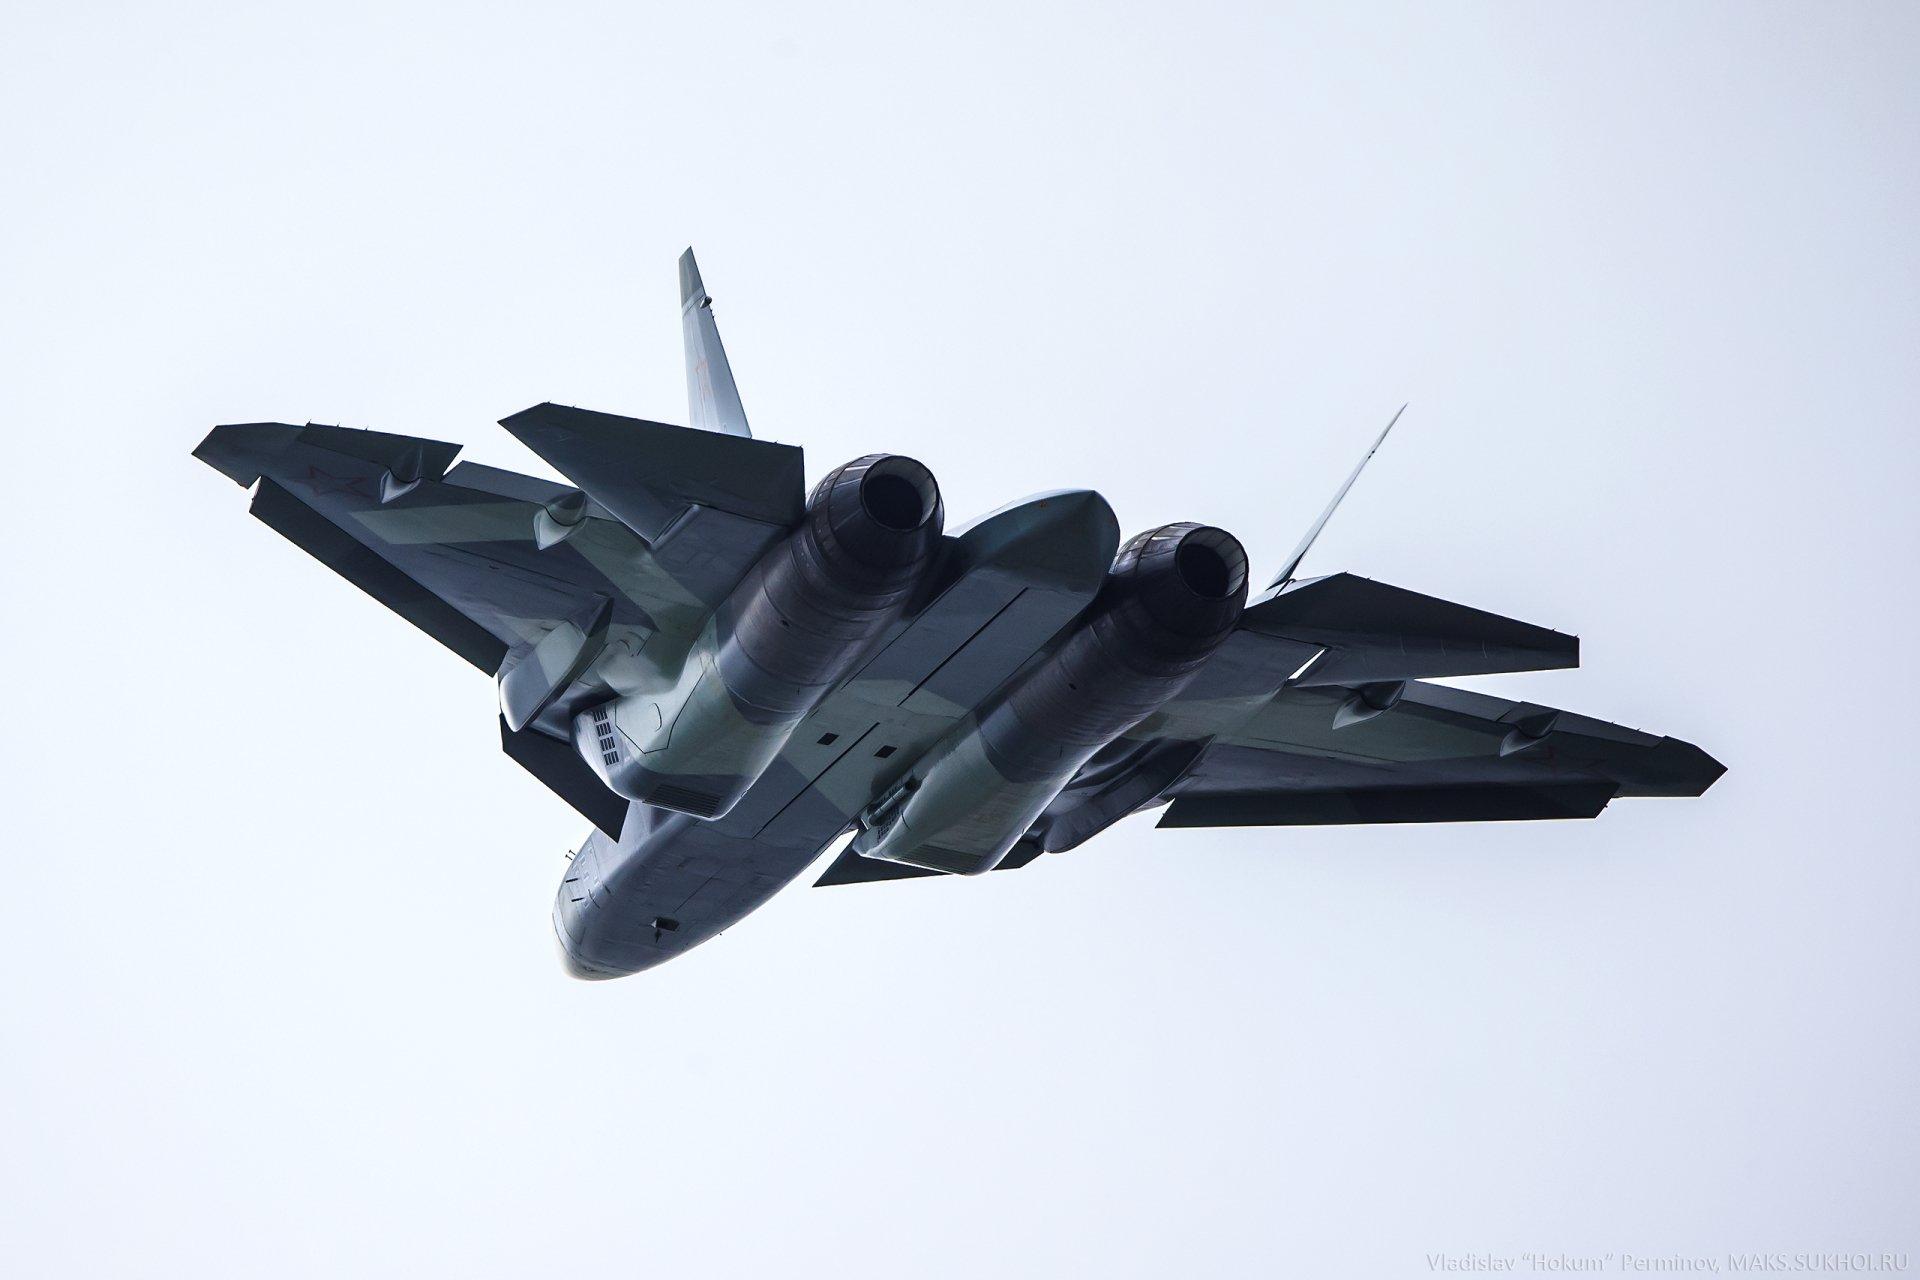 Military - Sukhoi Su-57  Jet Fighter Aircraft Warplane Wallpaper